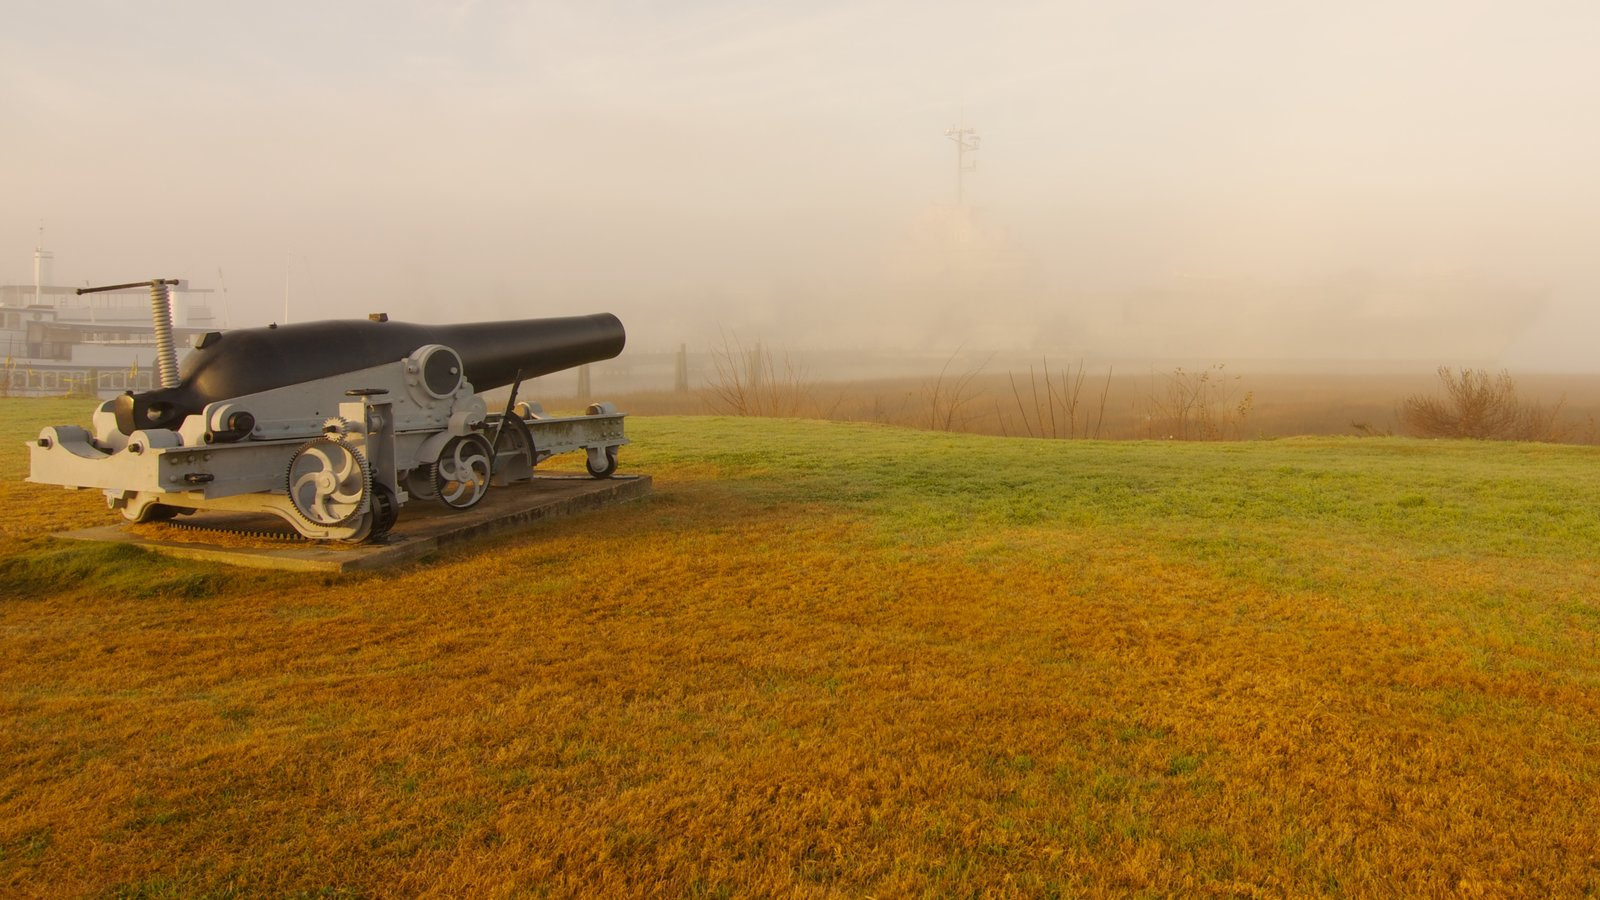 USS Yorktown caracterizando neblina e itens militares